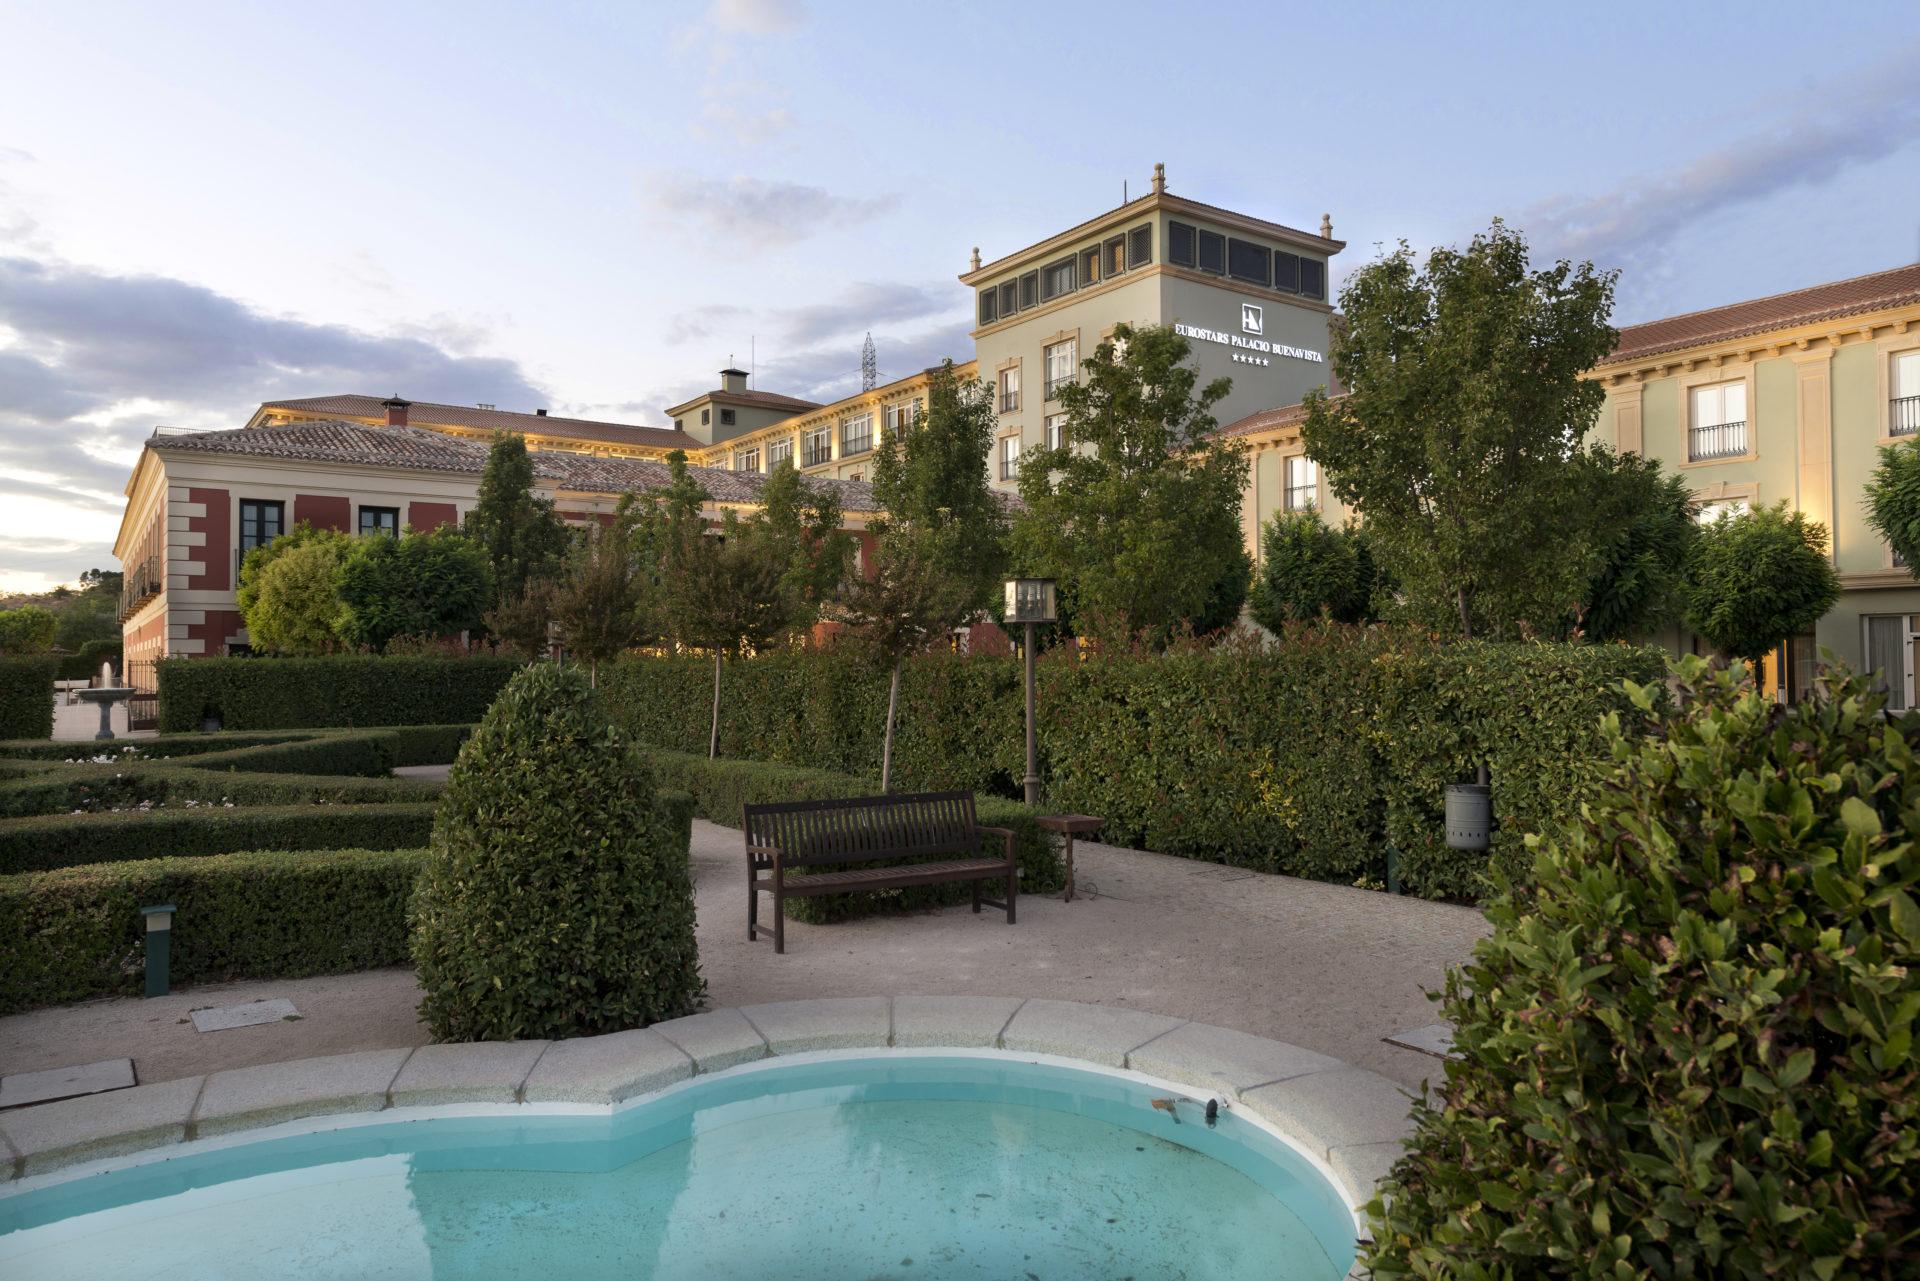 HOTEL EUROSTARS PALACIO BUENAVISTA